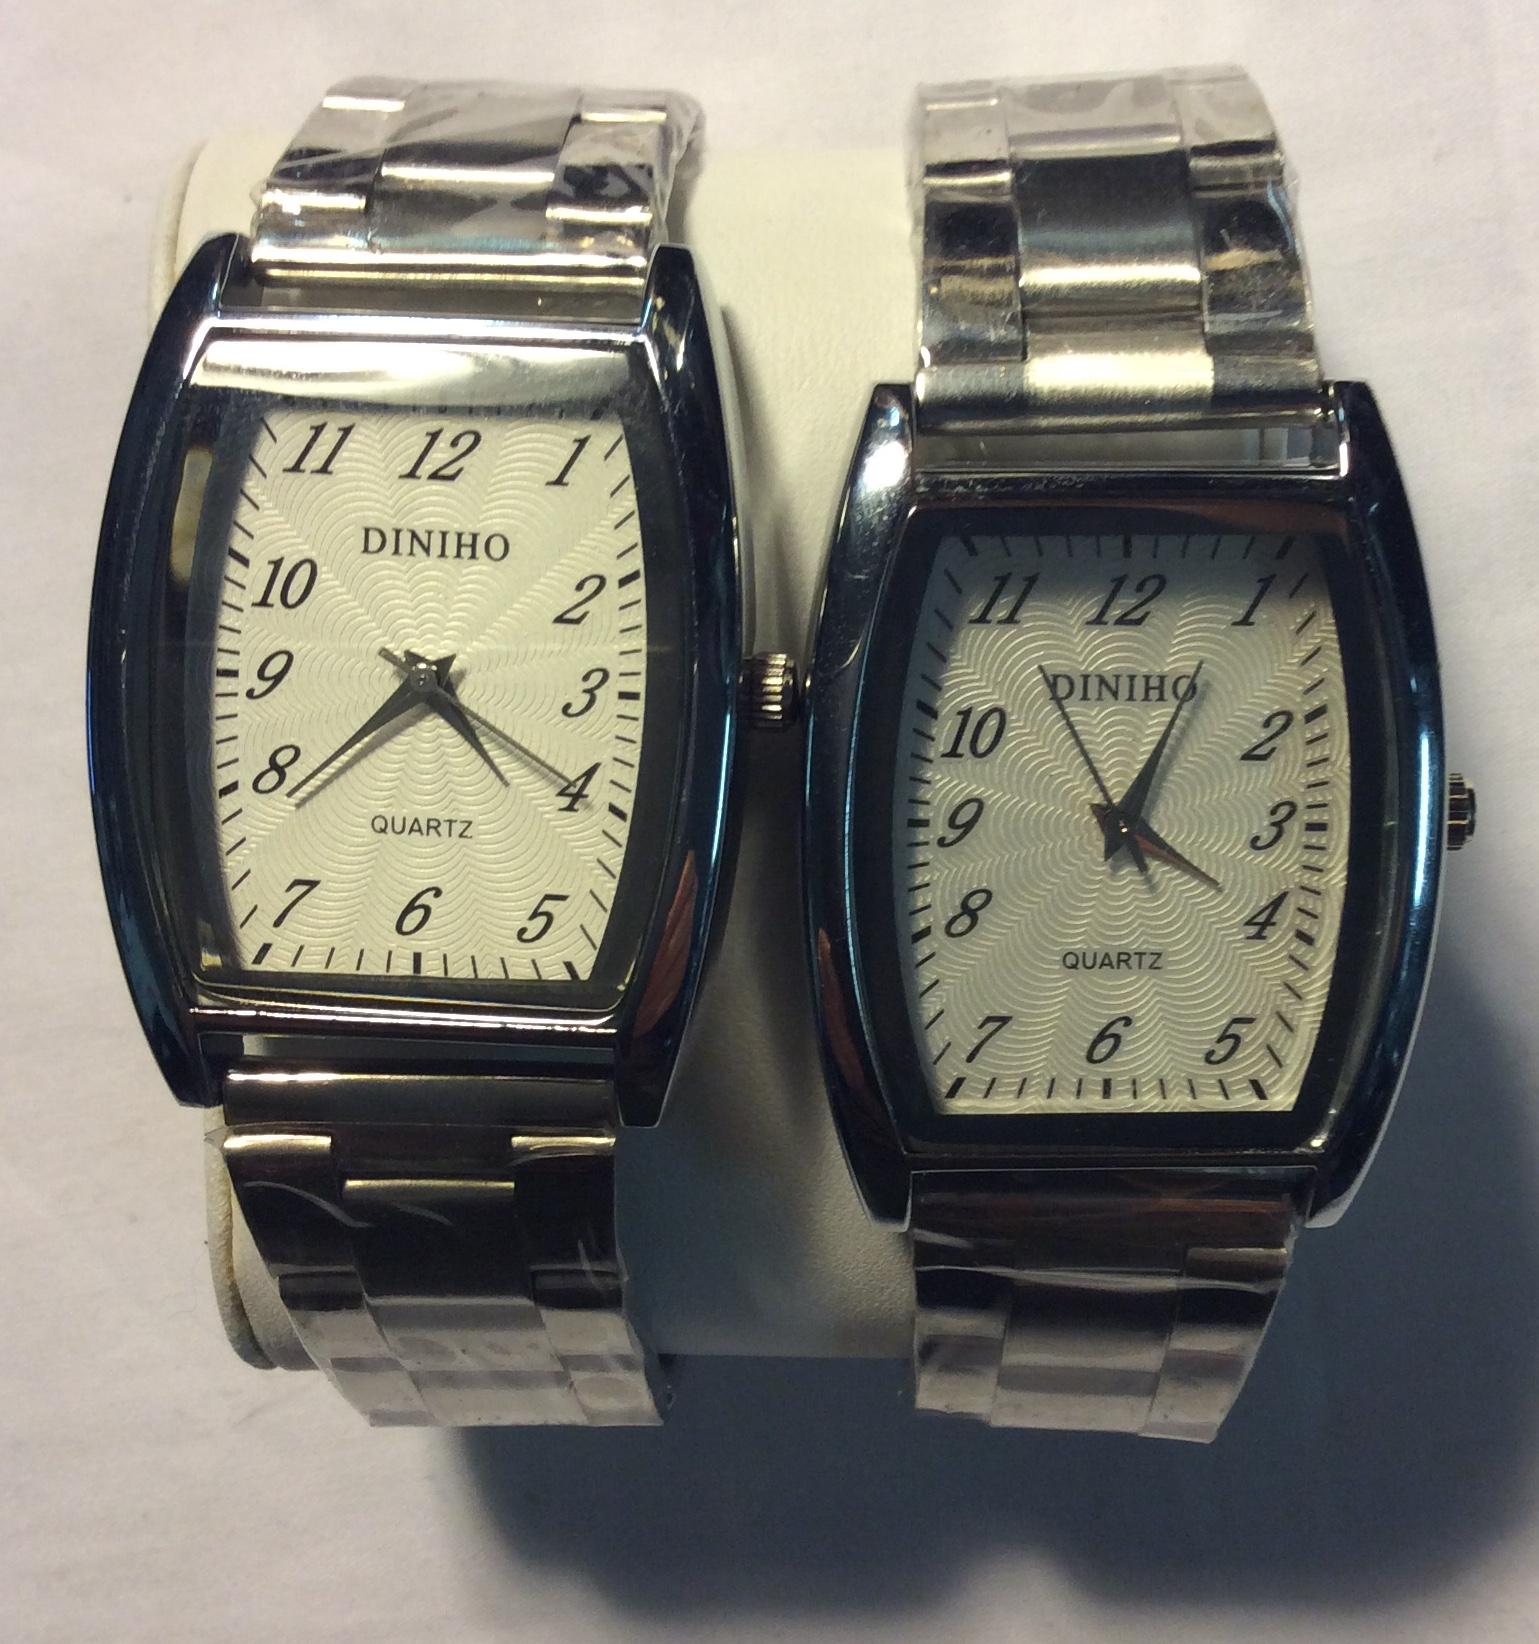 Diniho watch - Rectangular white